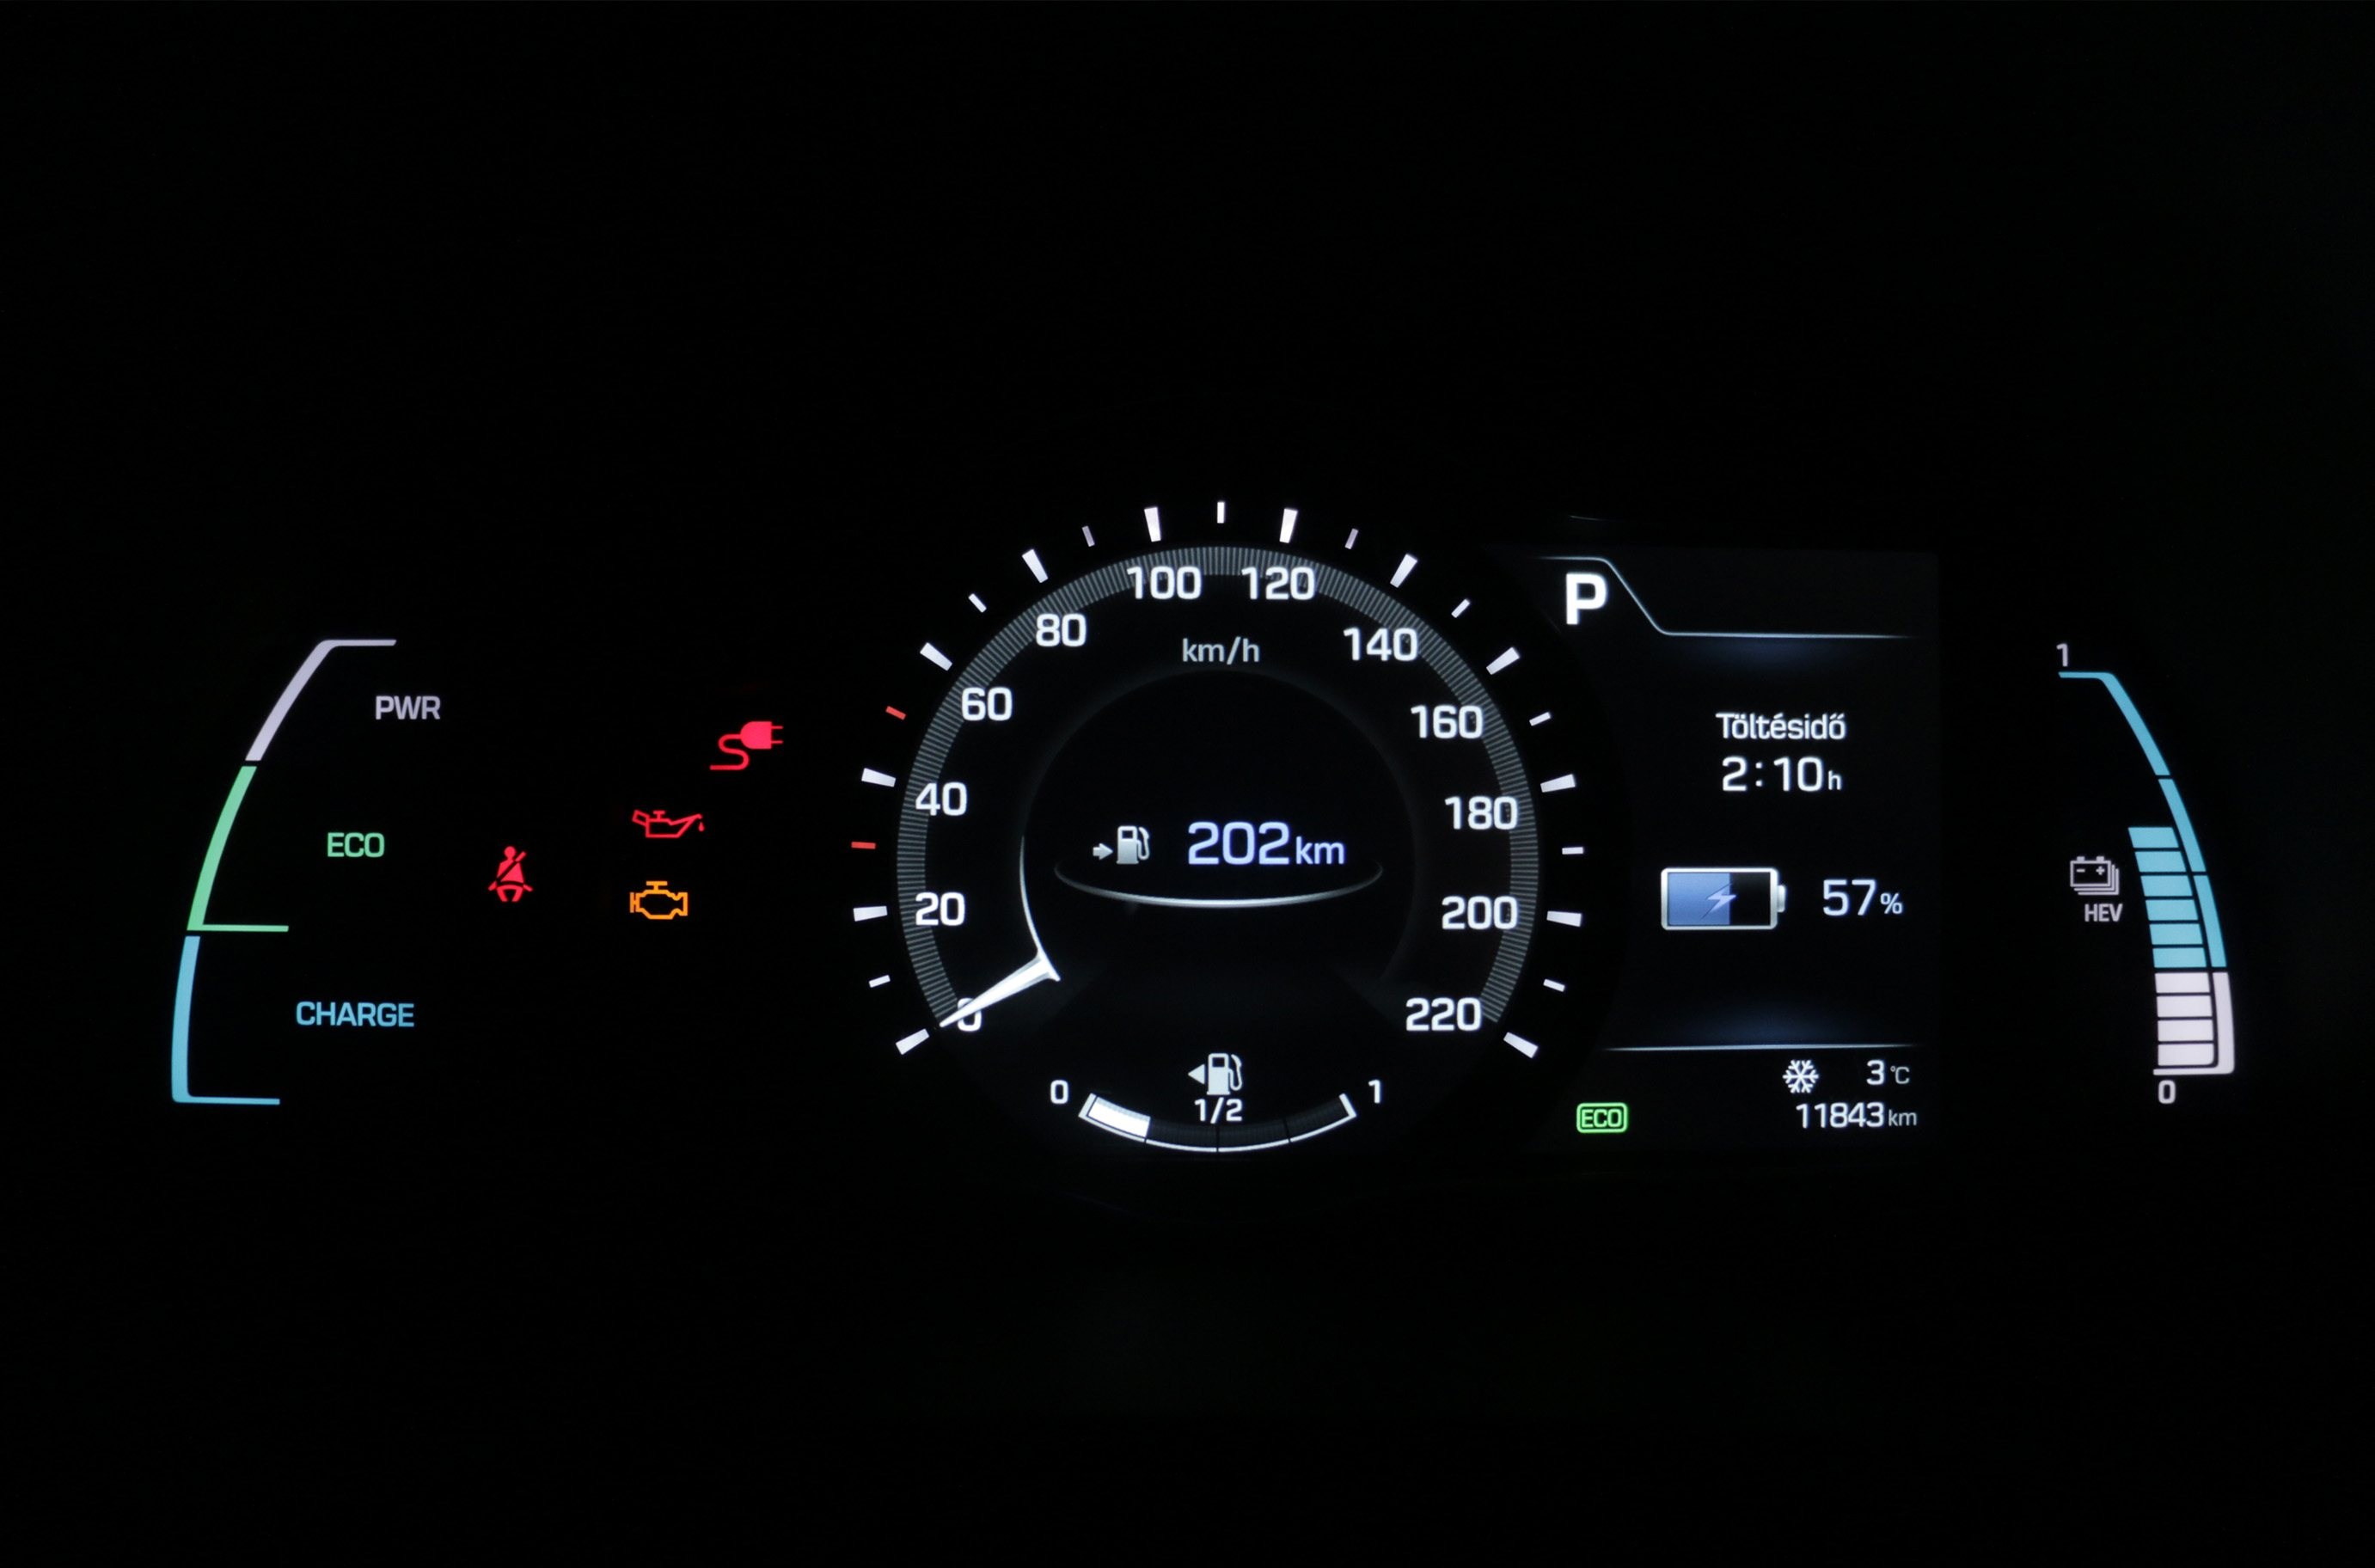 Hyundai_IONIQ_PHEV_test_5_zoldautok